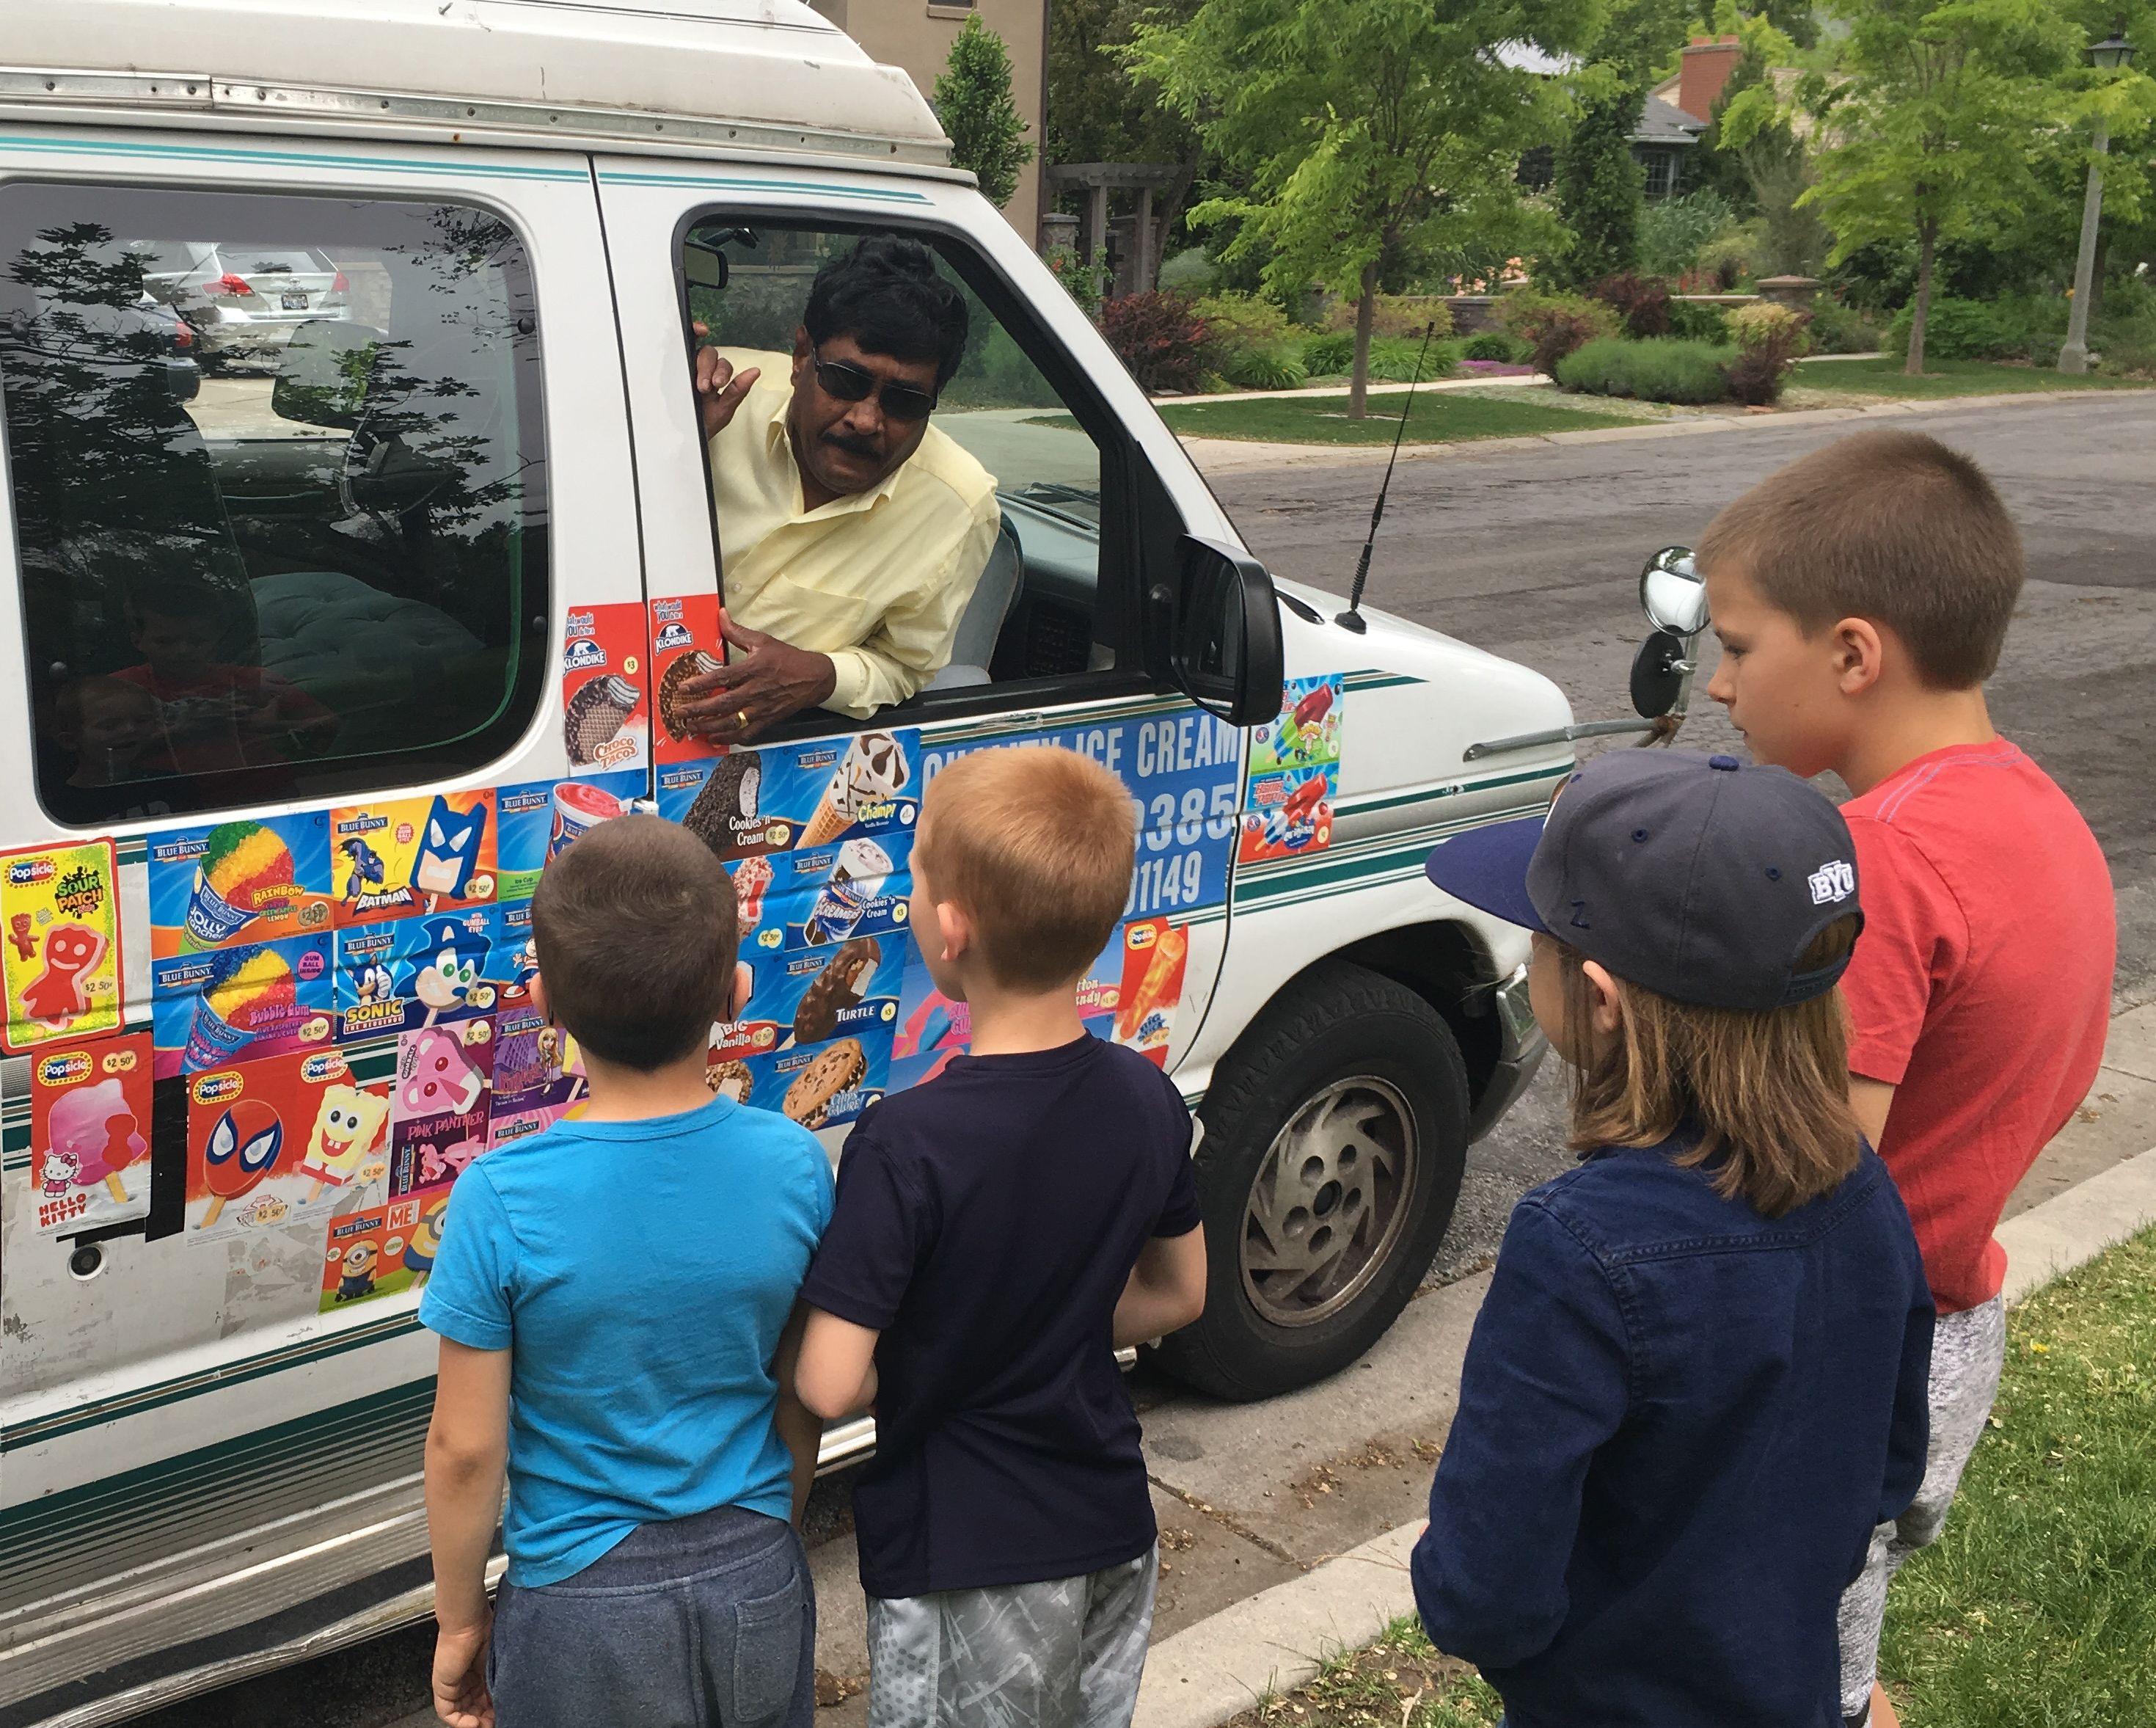 Four neighborhood boys reviewing treat options at the ice cream van, Salt Lake City, Utah, May 2016. | Photo by Kat Dayton, St. George News